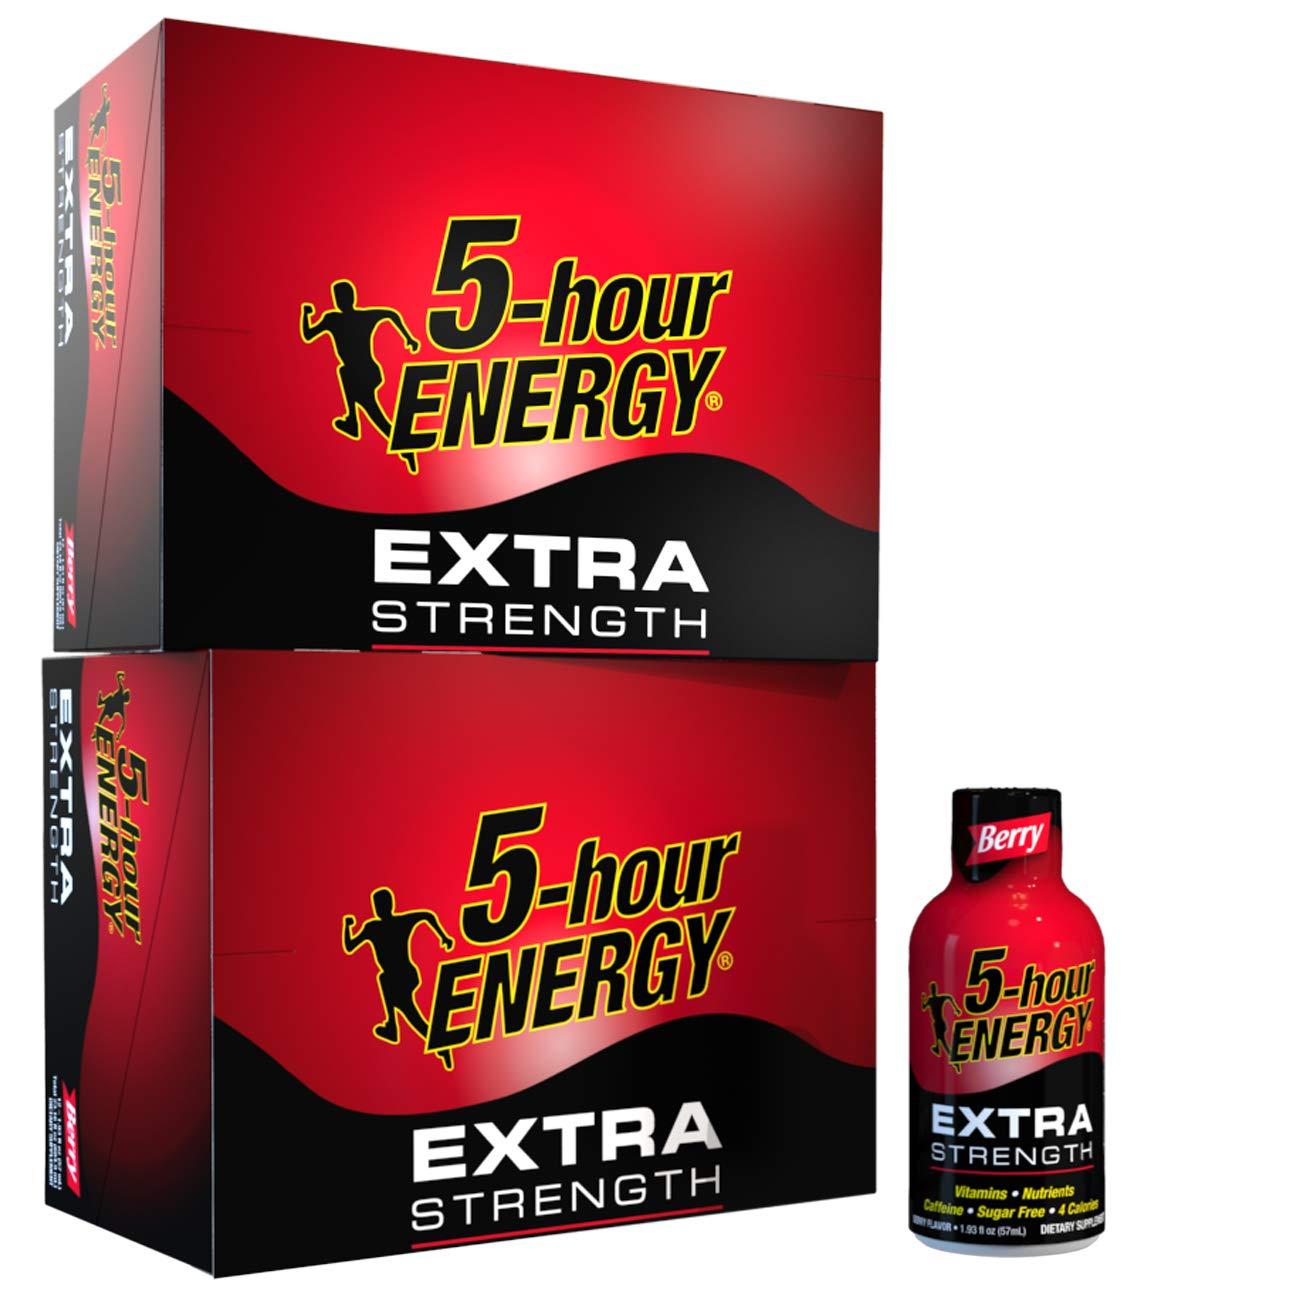 5-hour ENERGY Shot, Extra Strength, Berry, 1.93 Ounce, 24 Count